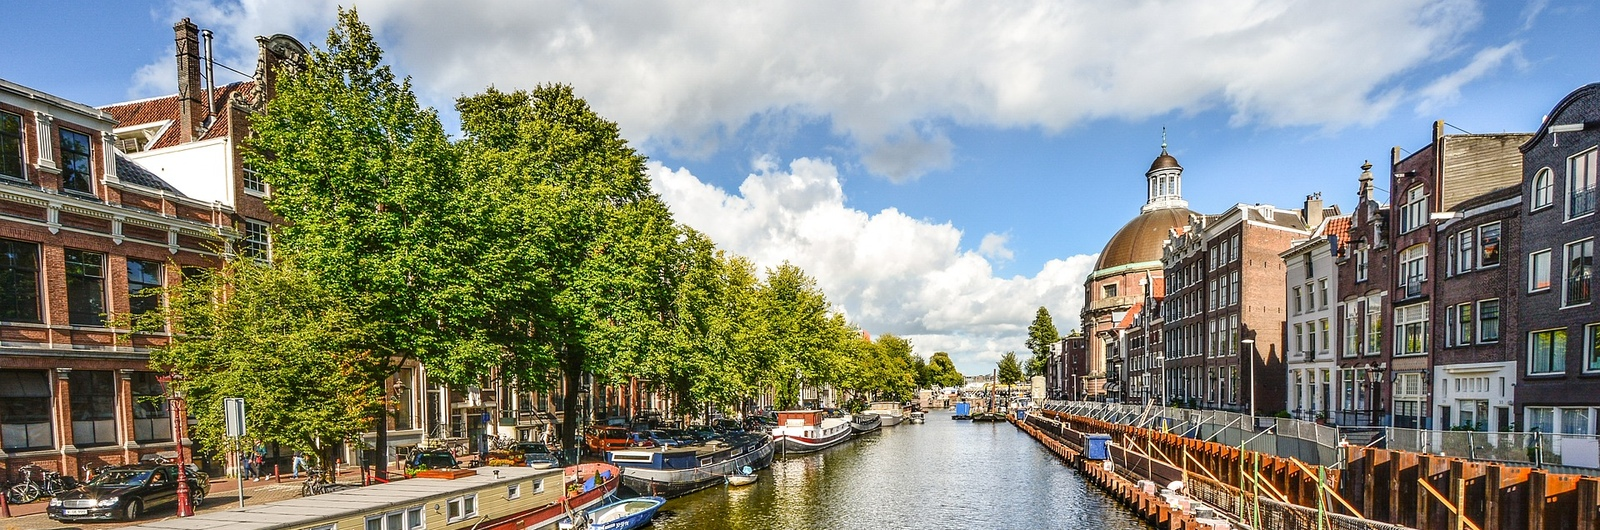 amsterdam city header